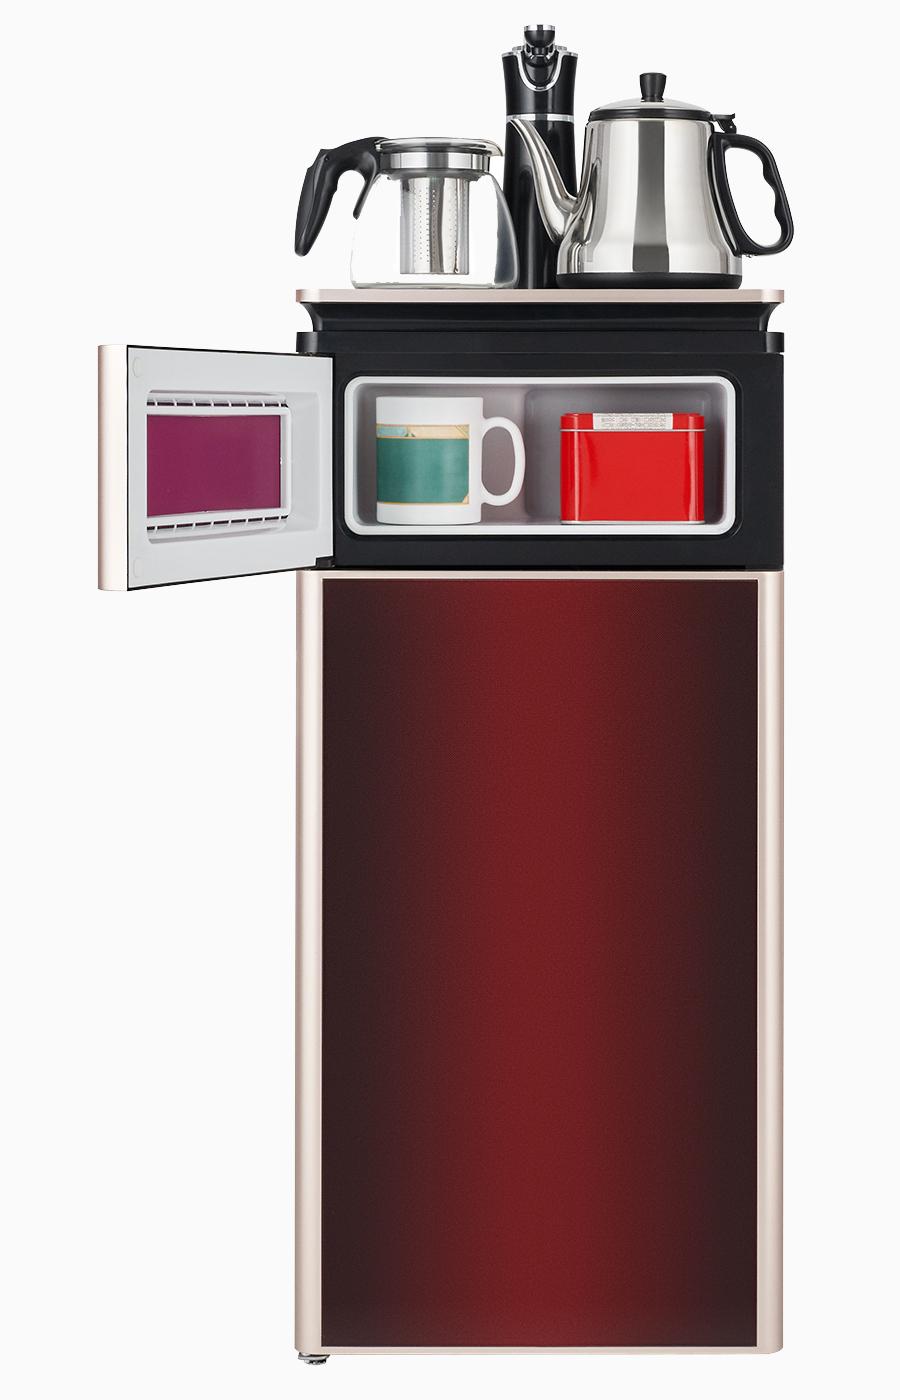 Кулер с чайным столиком Тиабар LK-AEL-51a red